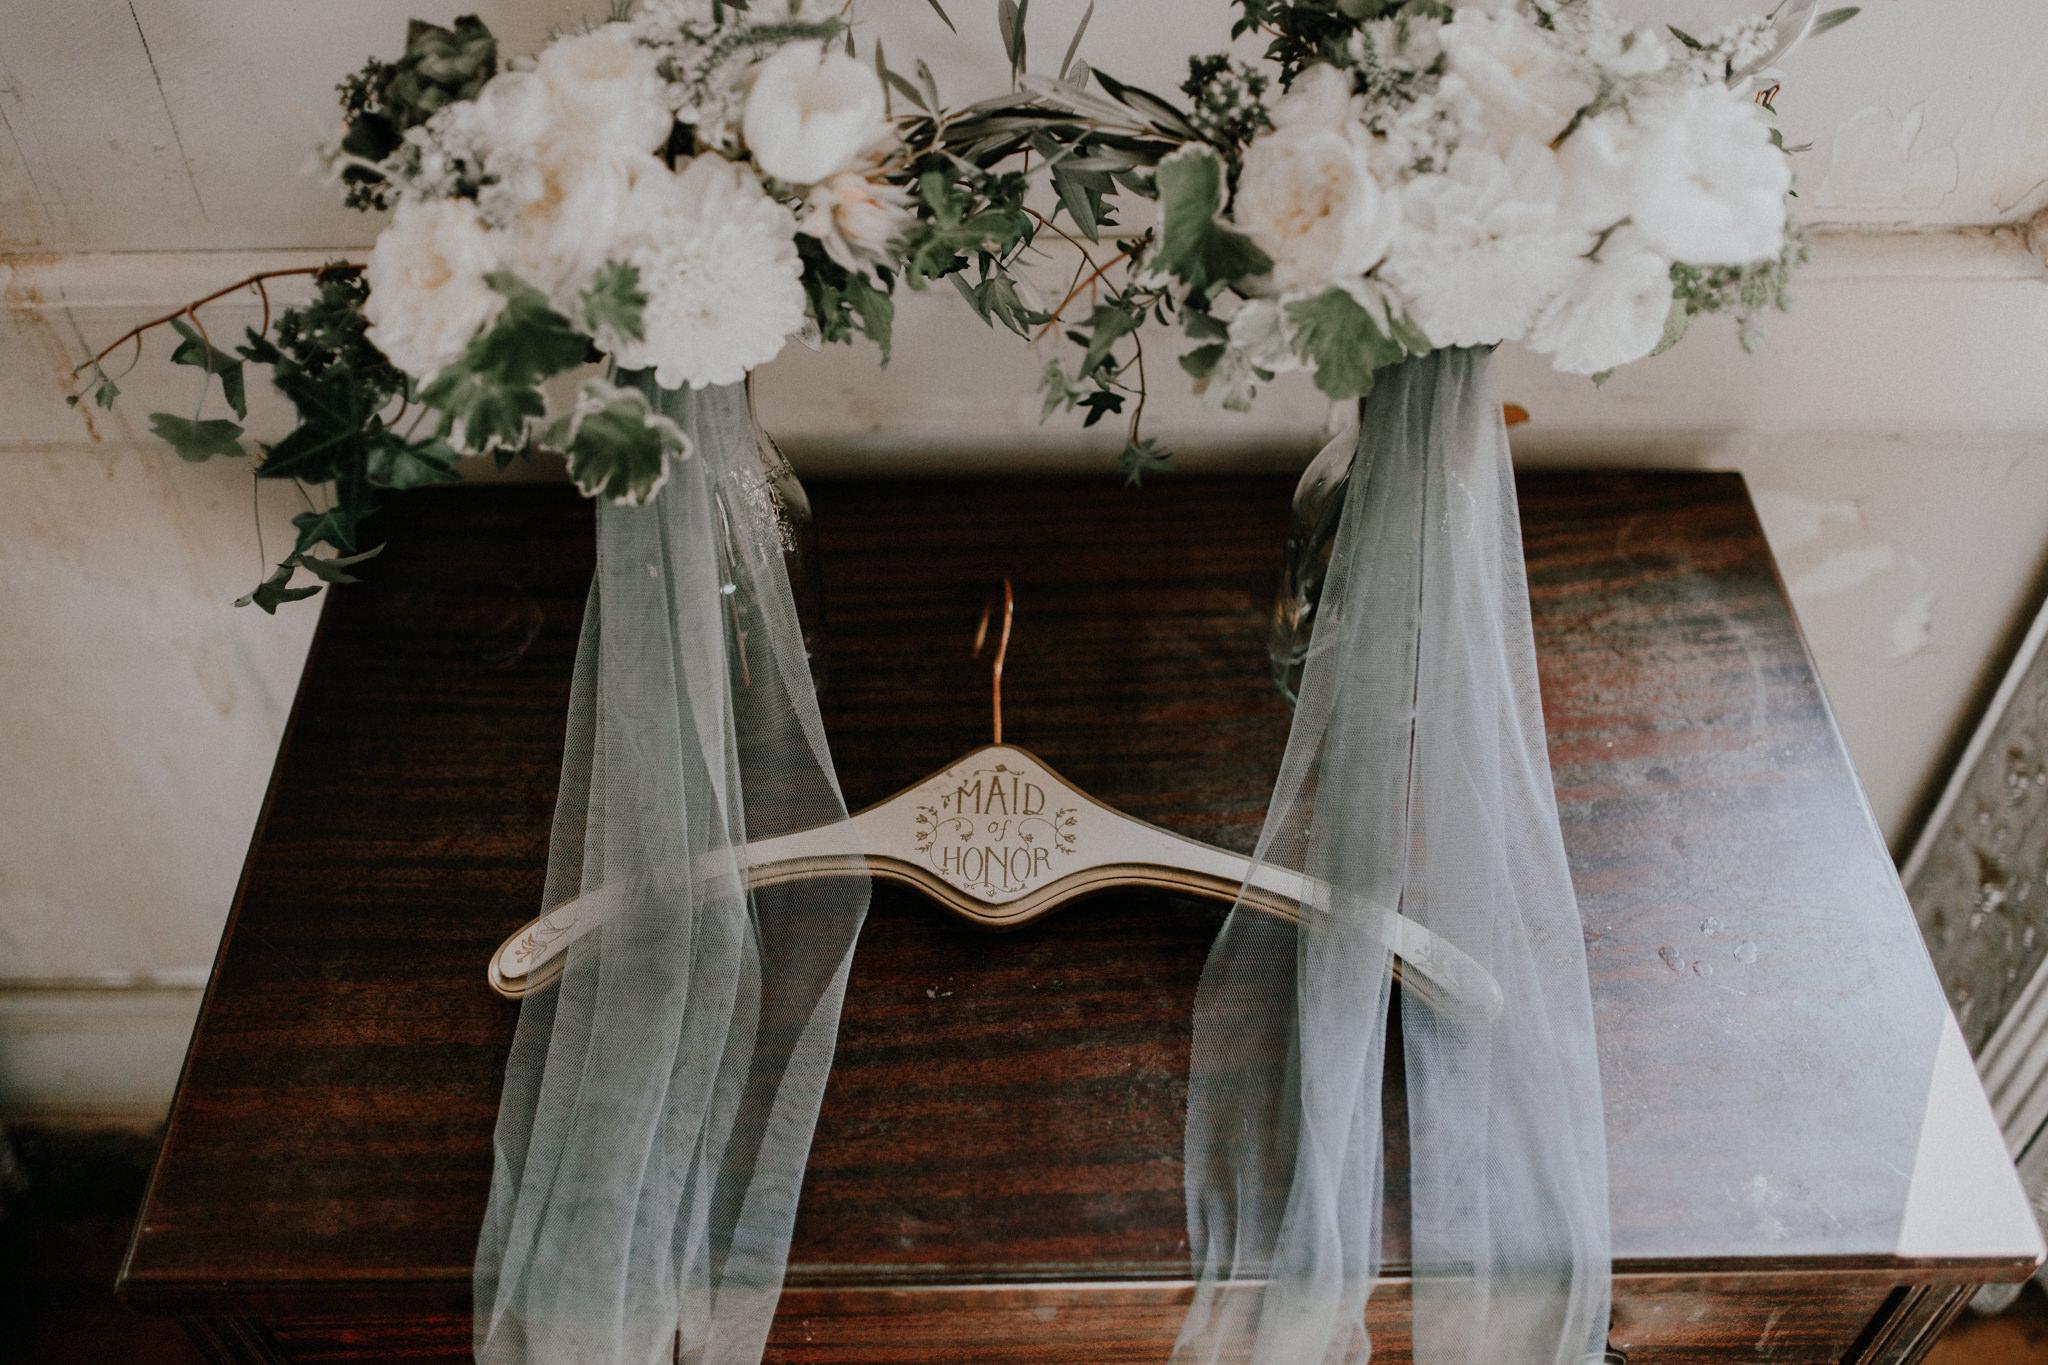 wedding-headlands-center-for-the-arts-sausalito-21.jpg